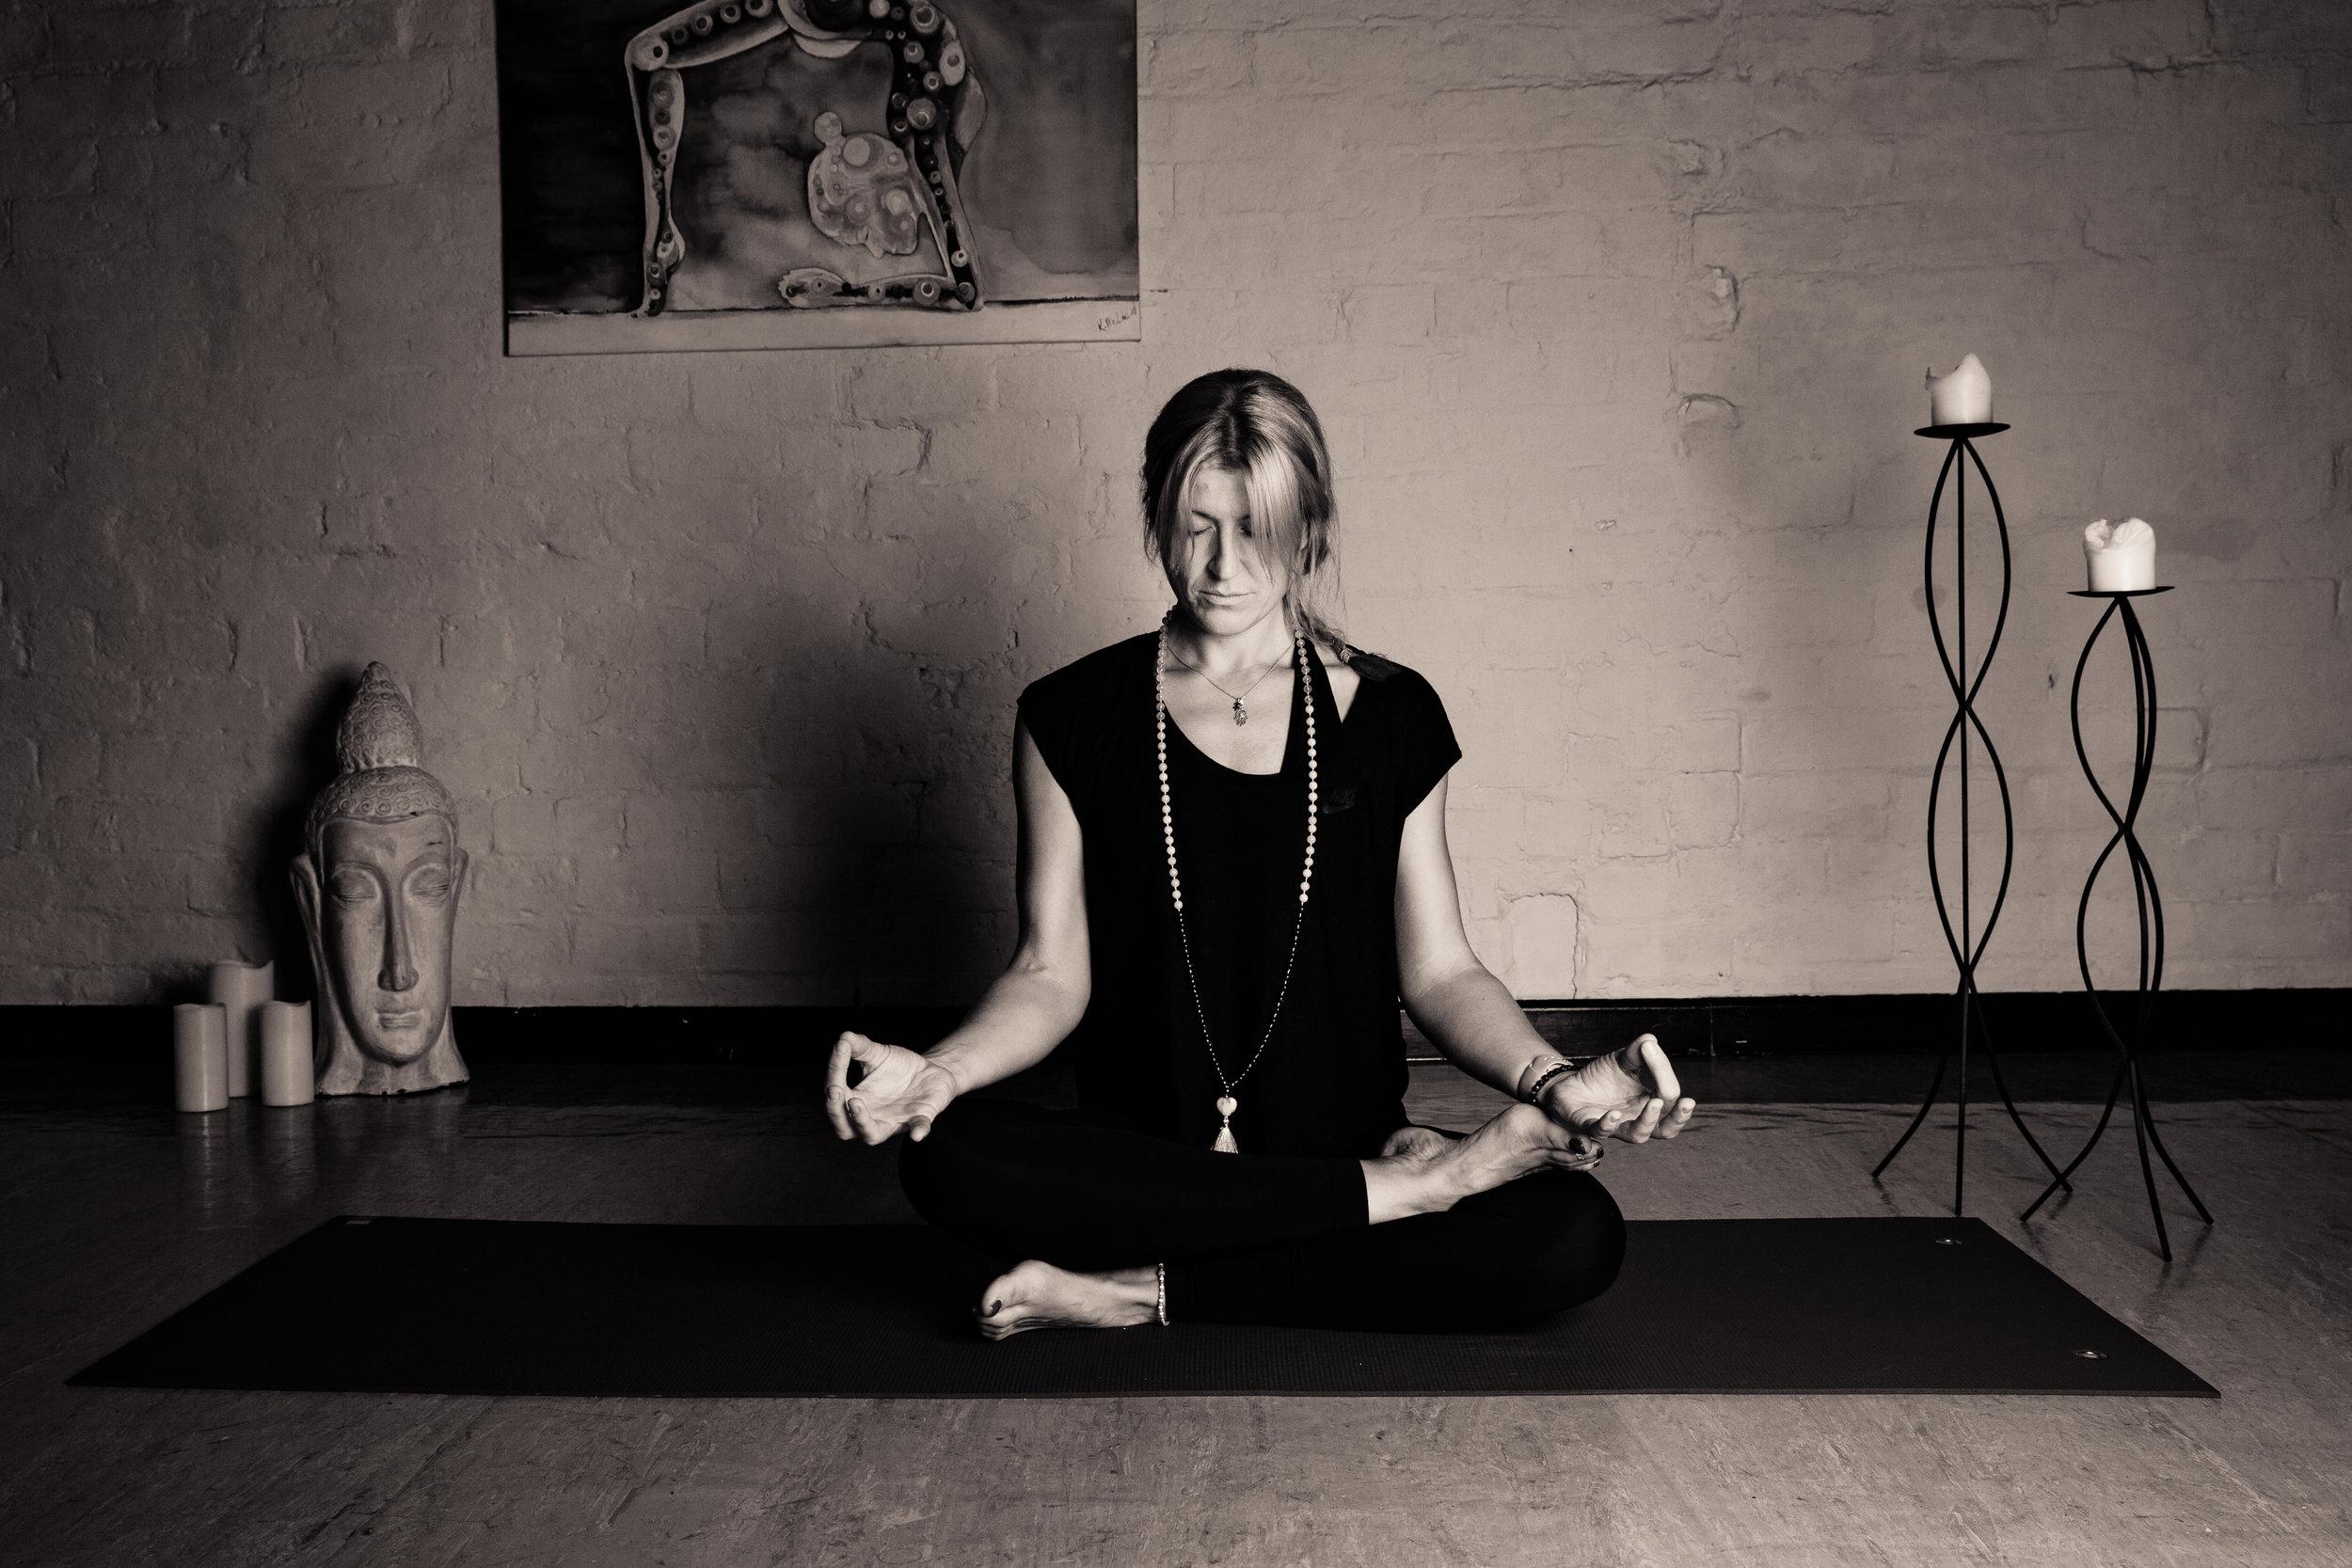 Asher Yoga